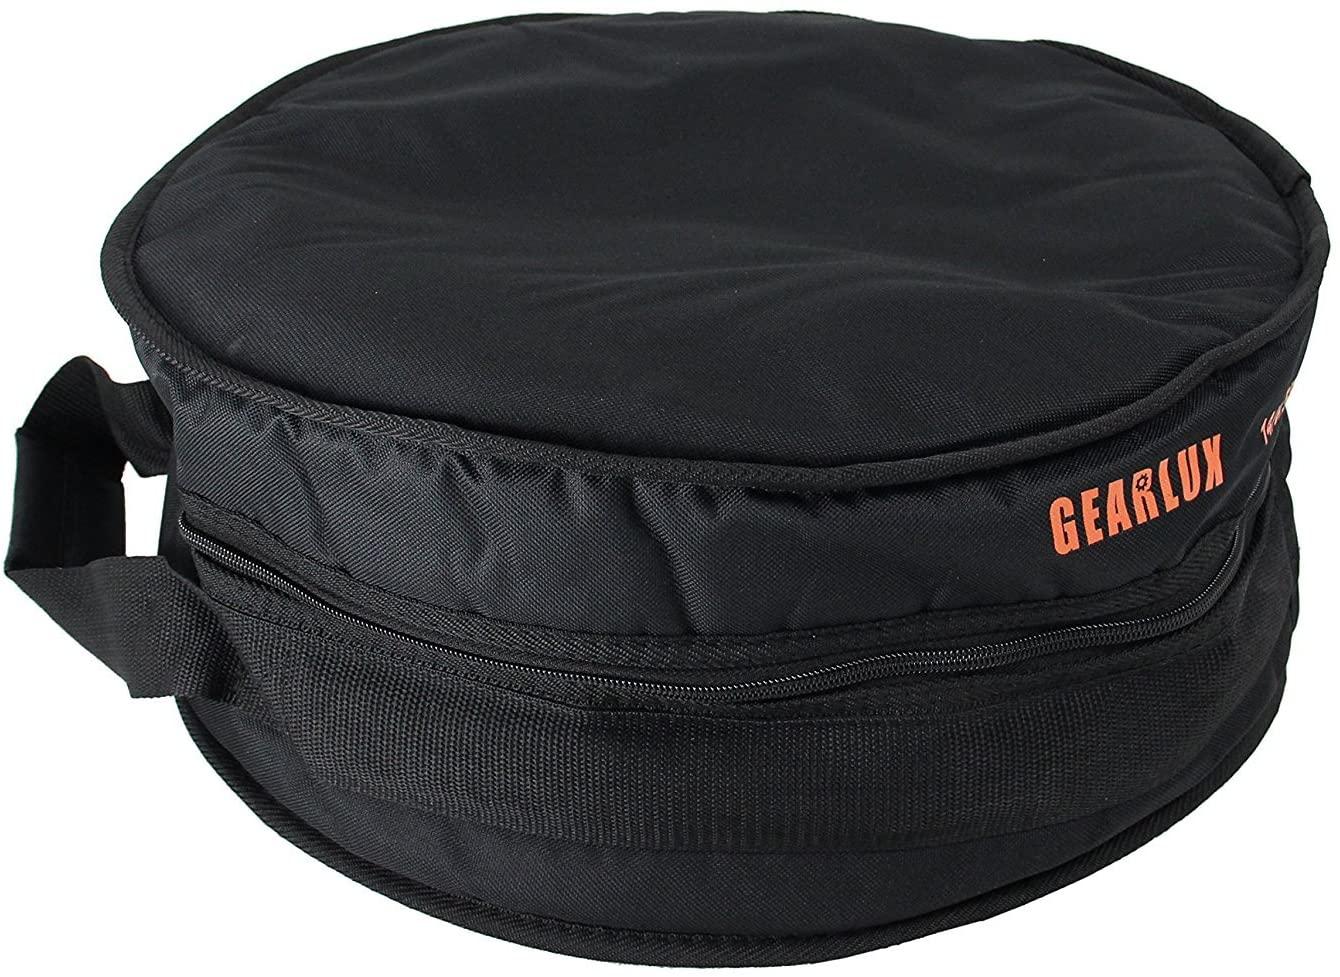 Gearlux 14-Inch Snare Drum Bag